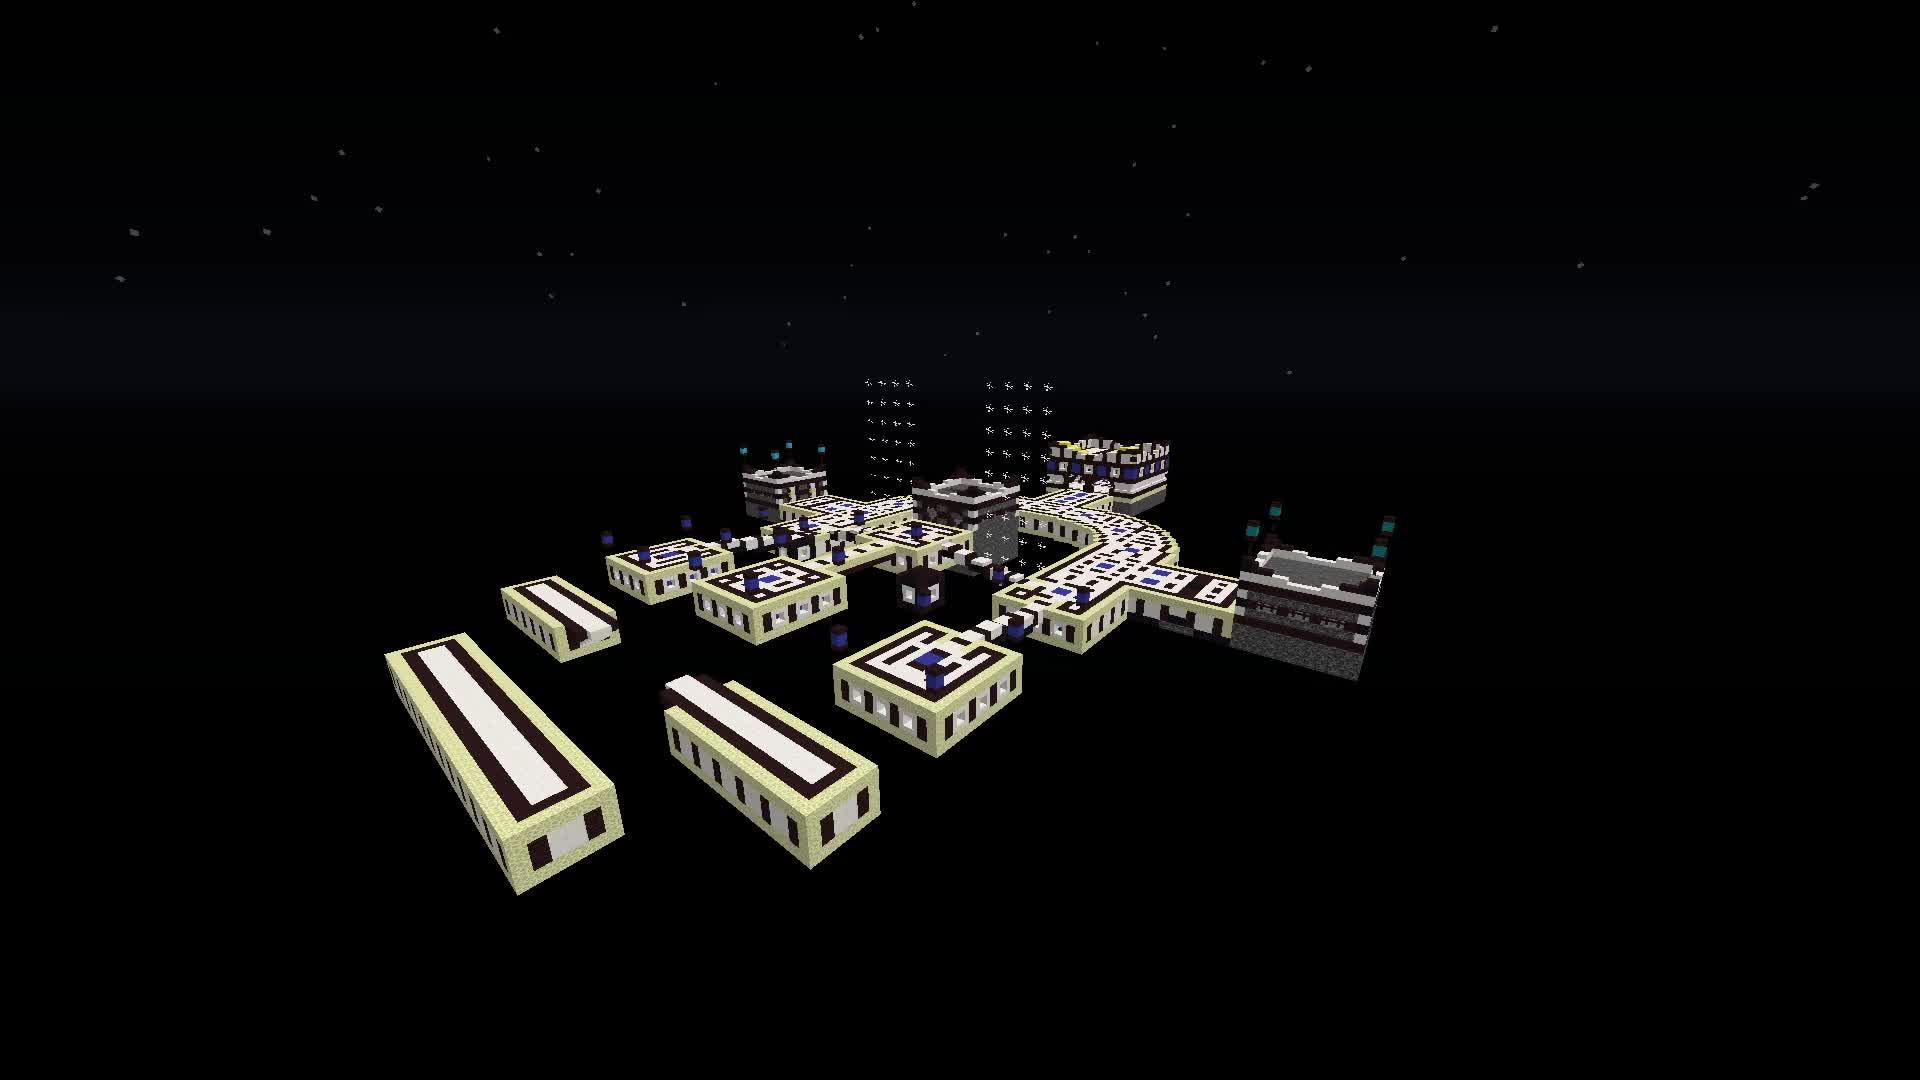 Capture The Wool, Minecraft, PVP, Stratus Network, play.stratus.network, HowToBridge GIFs